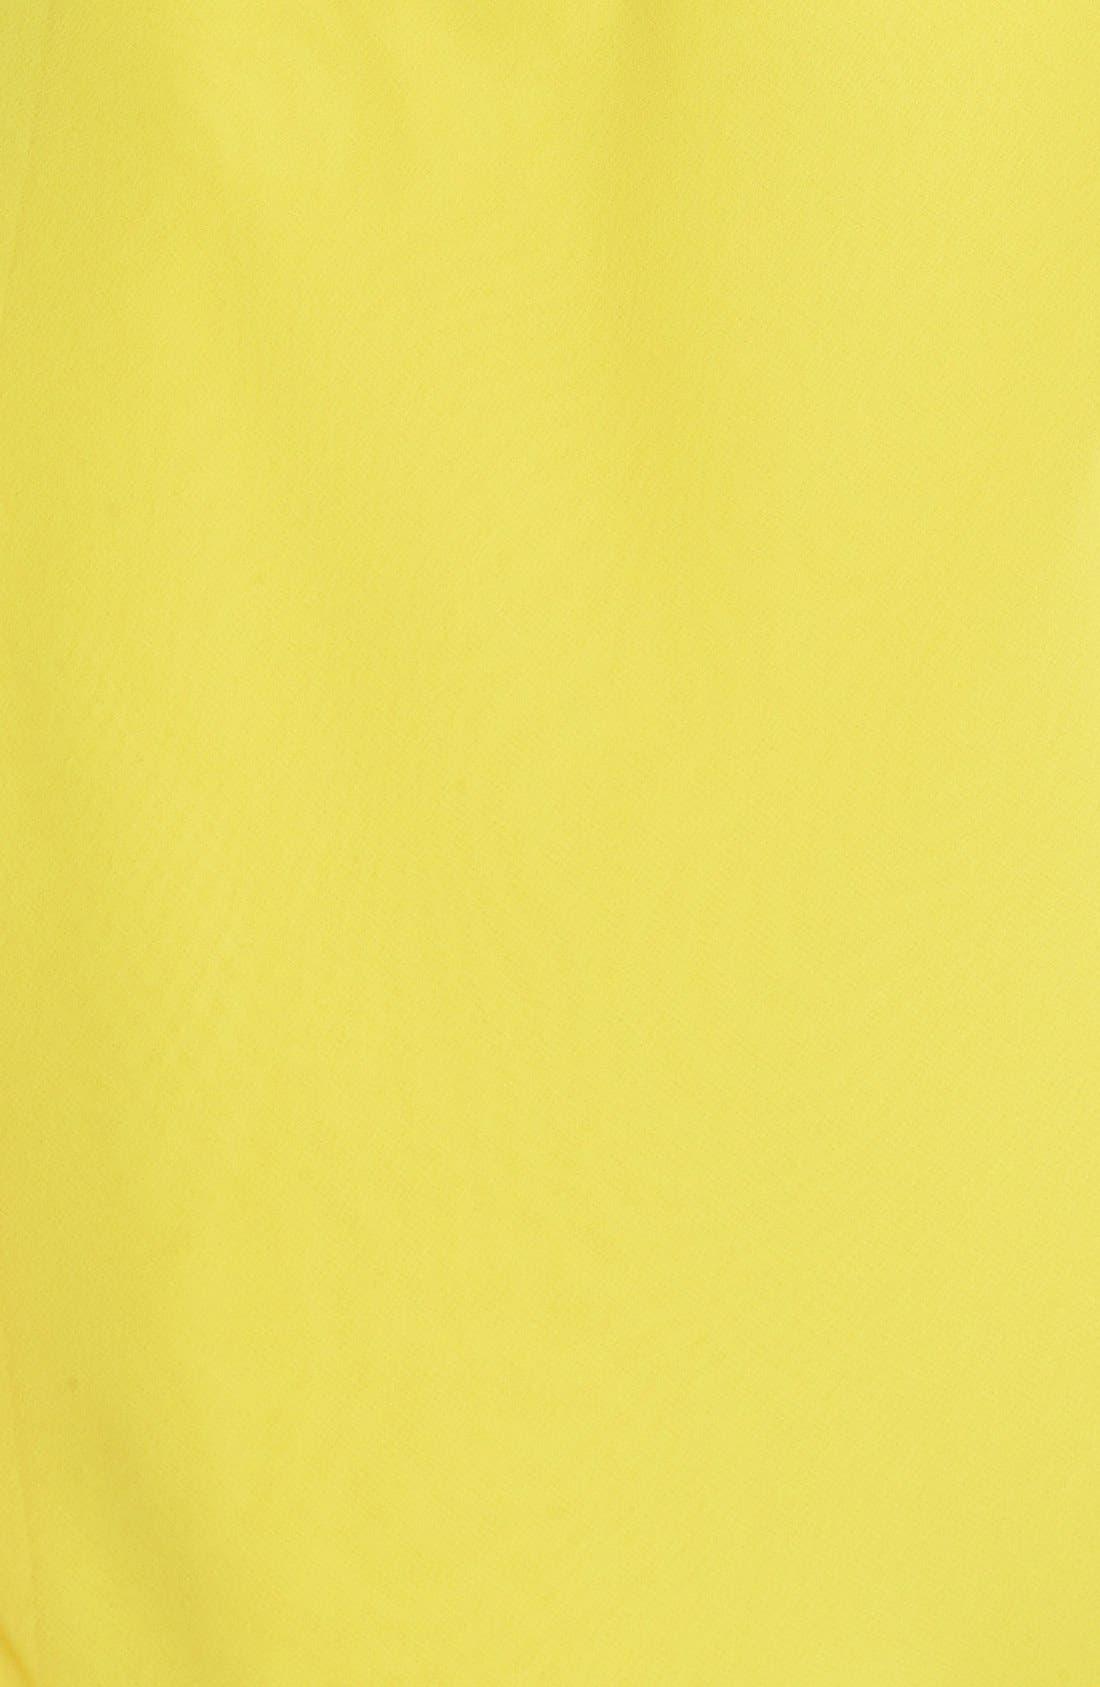 Alternate Image 4  - Laundry by Shelli Segal One-Shoulder Drape Chiffon Dress